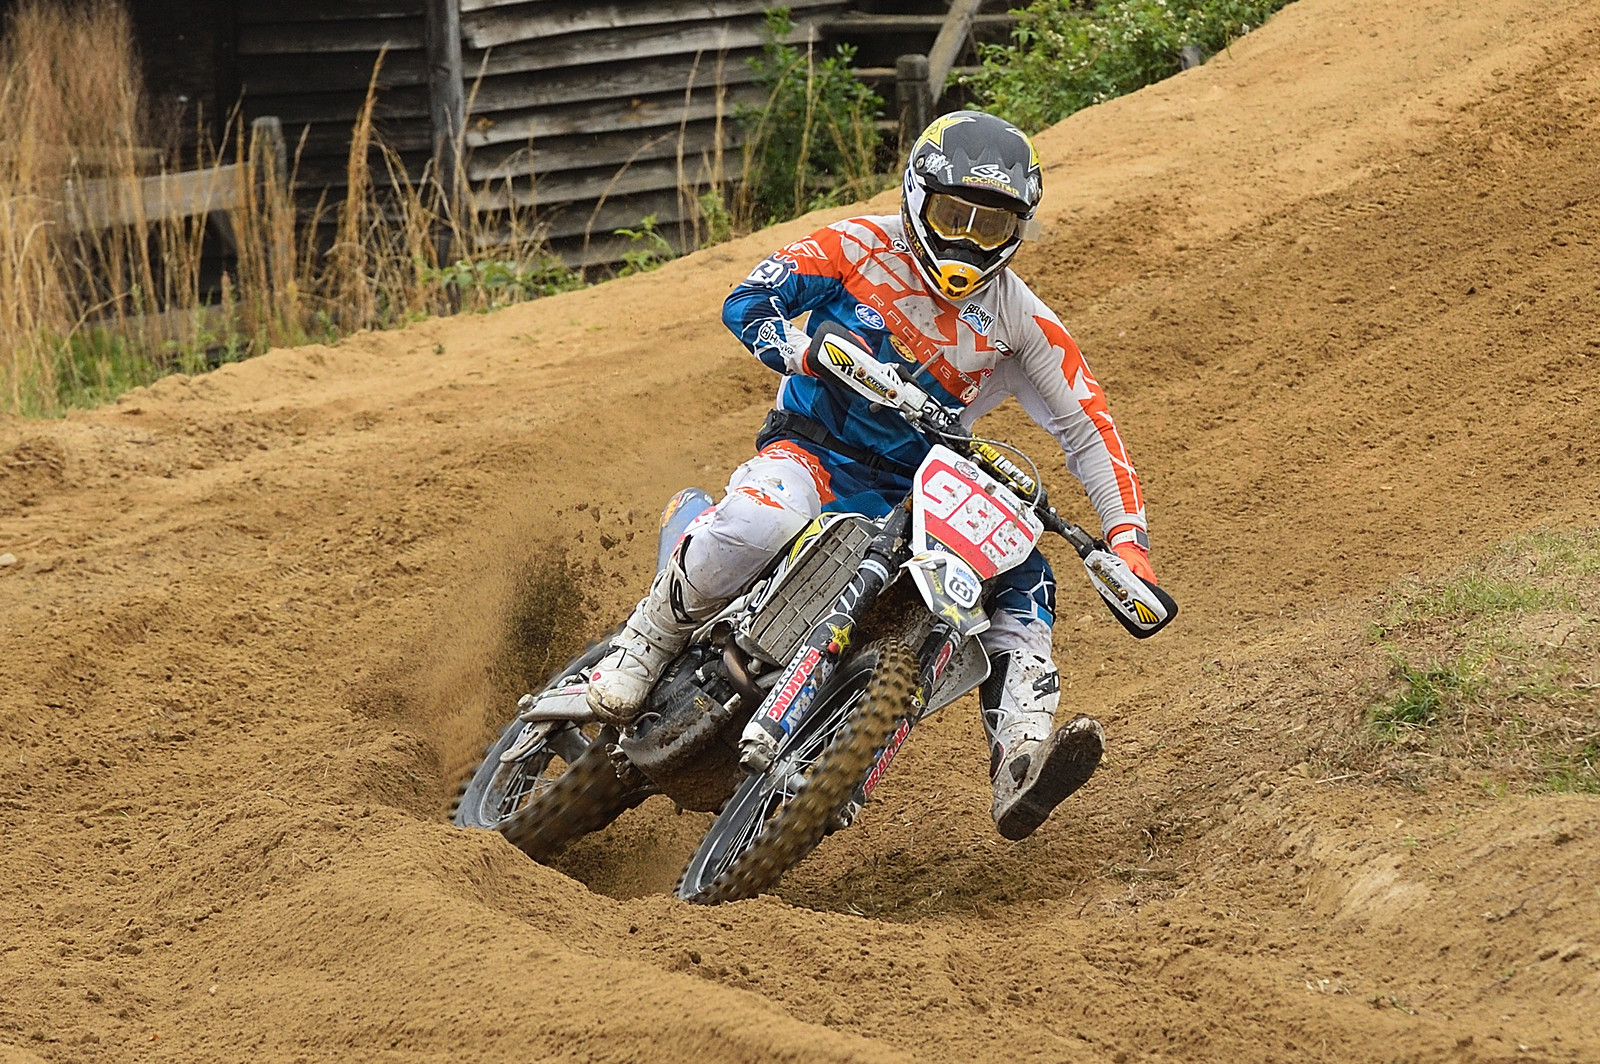 Thad Duvall - GuyB - Motocross Pictures - Vital MX